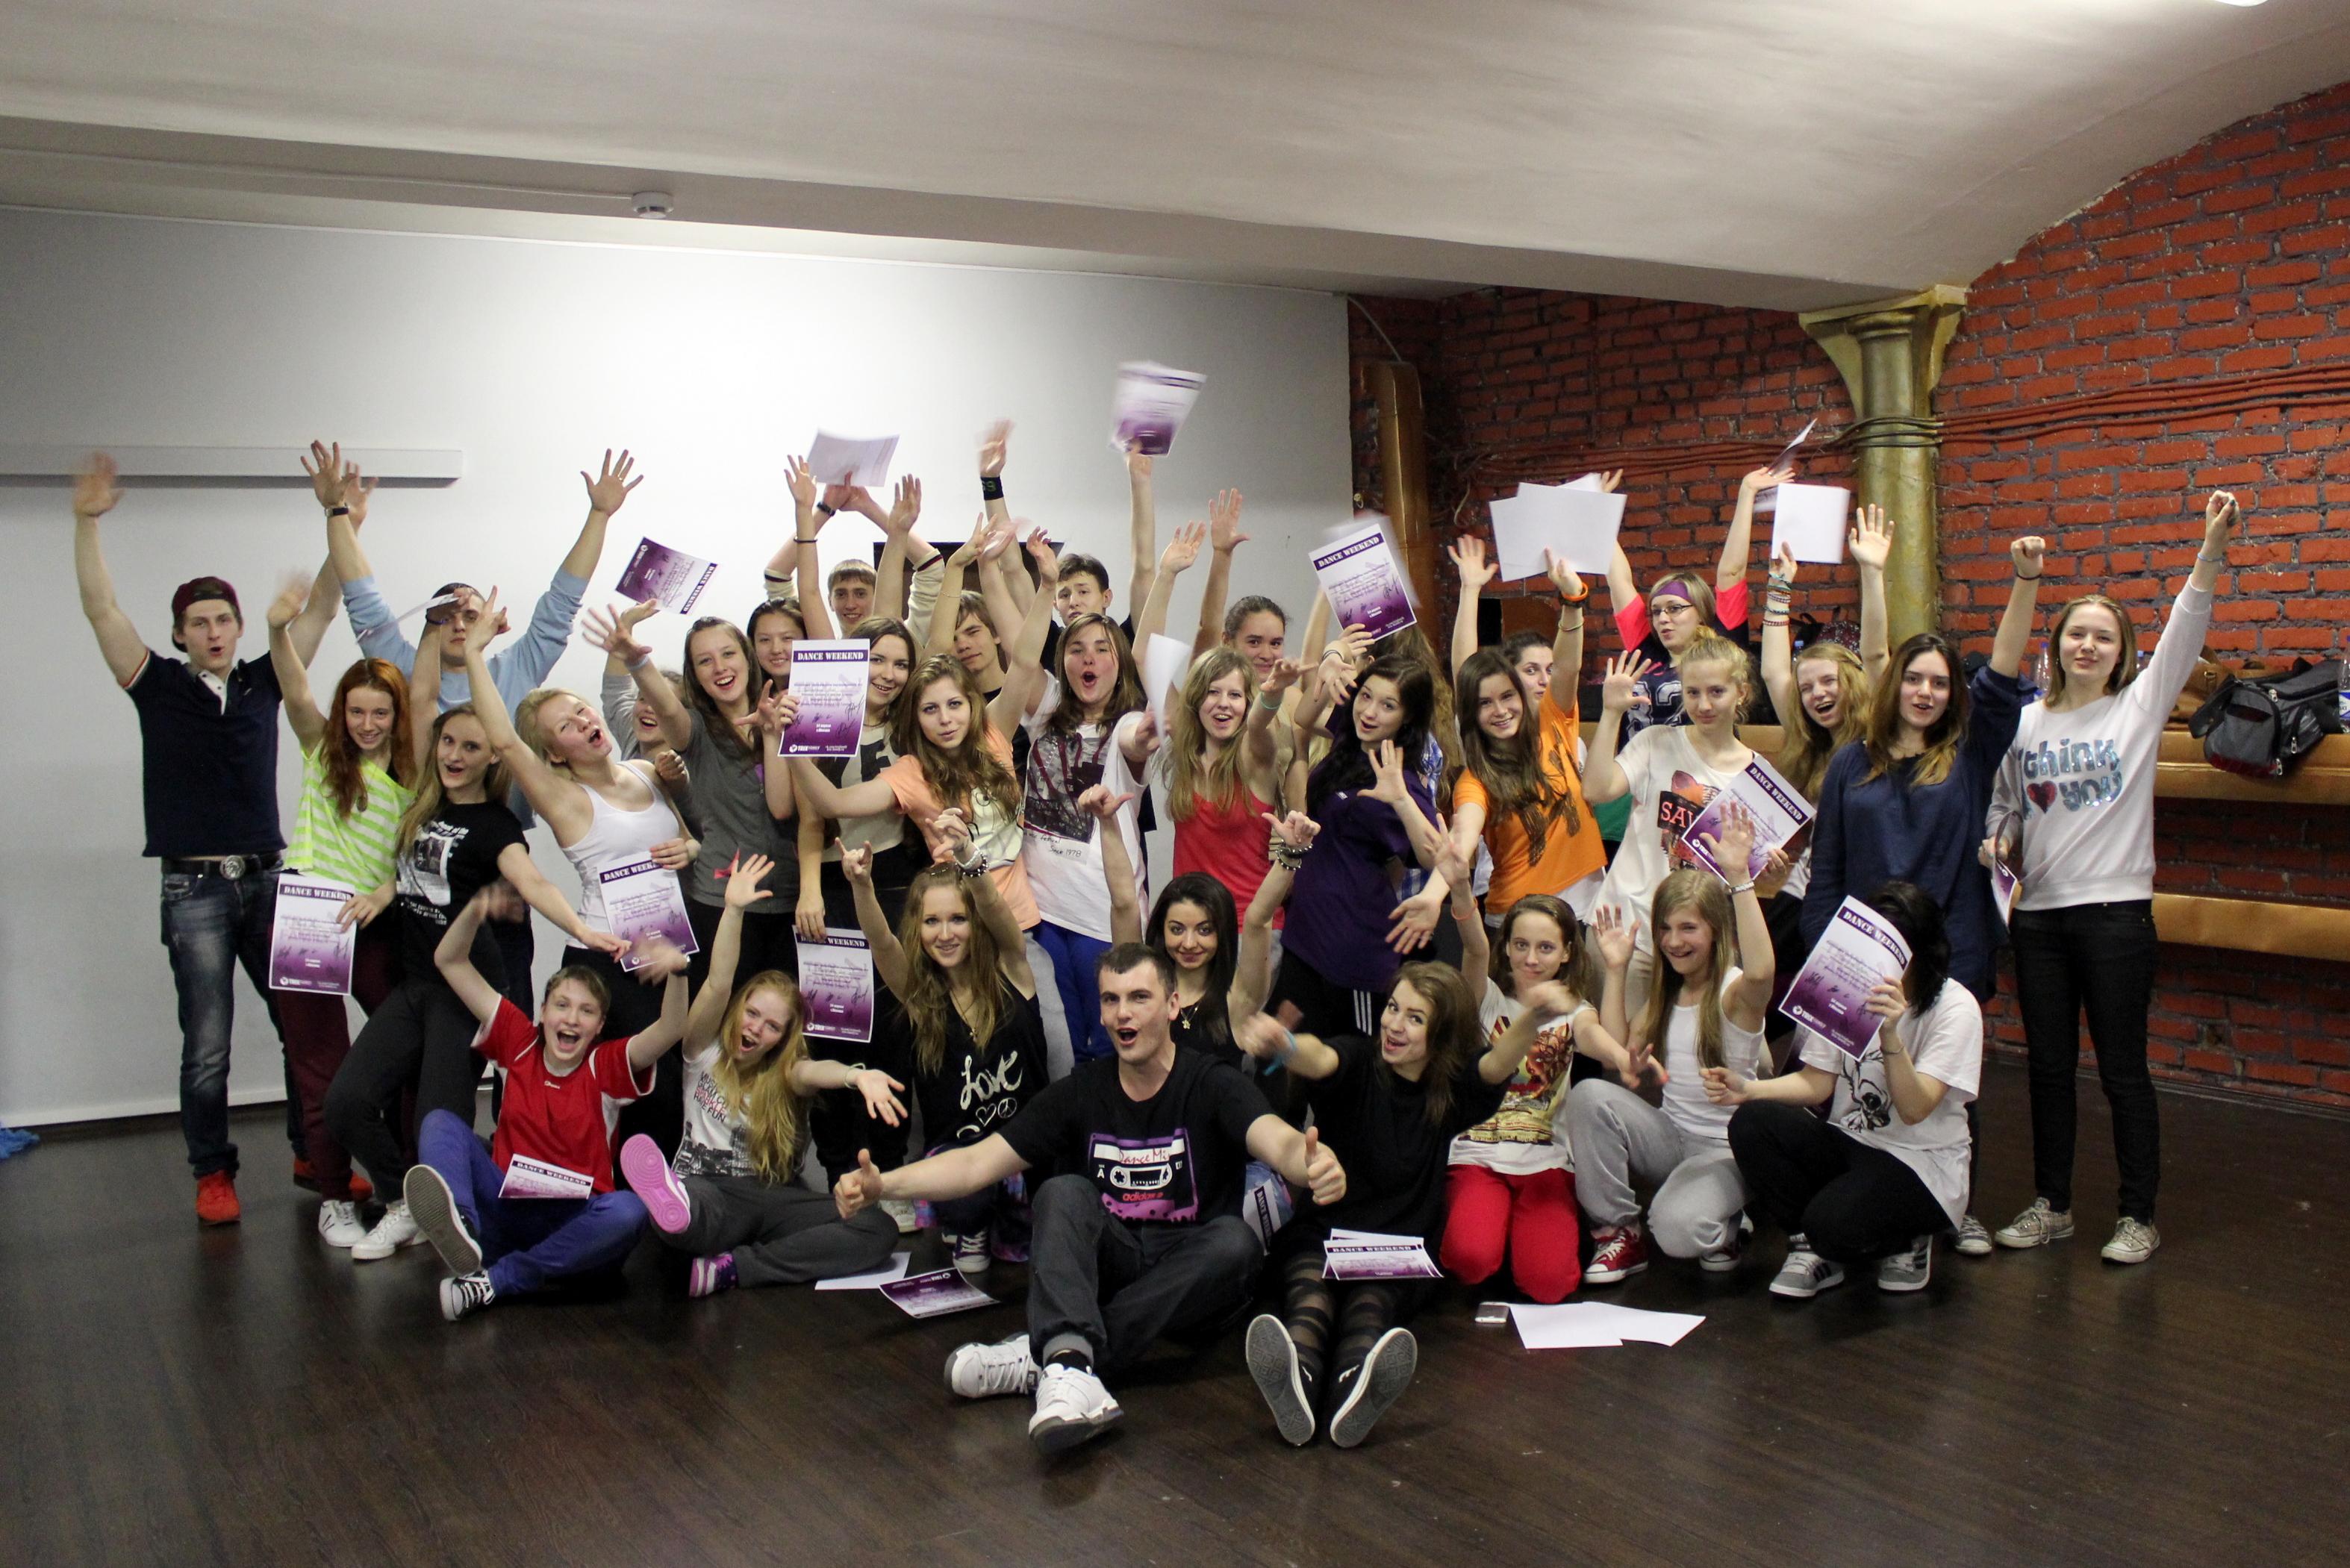 Трикс Фэмили Данс Уикенд Dance Weekend